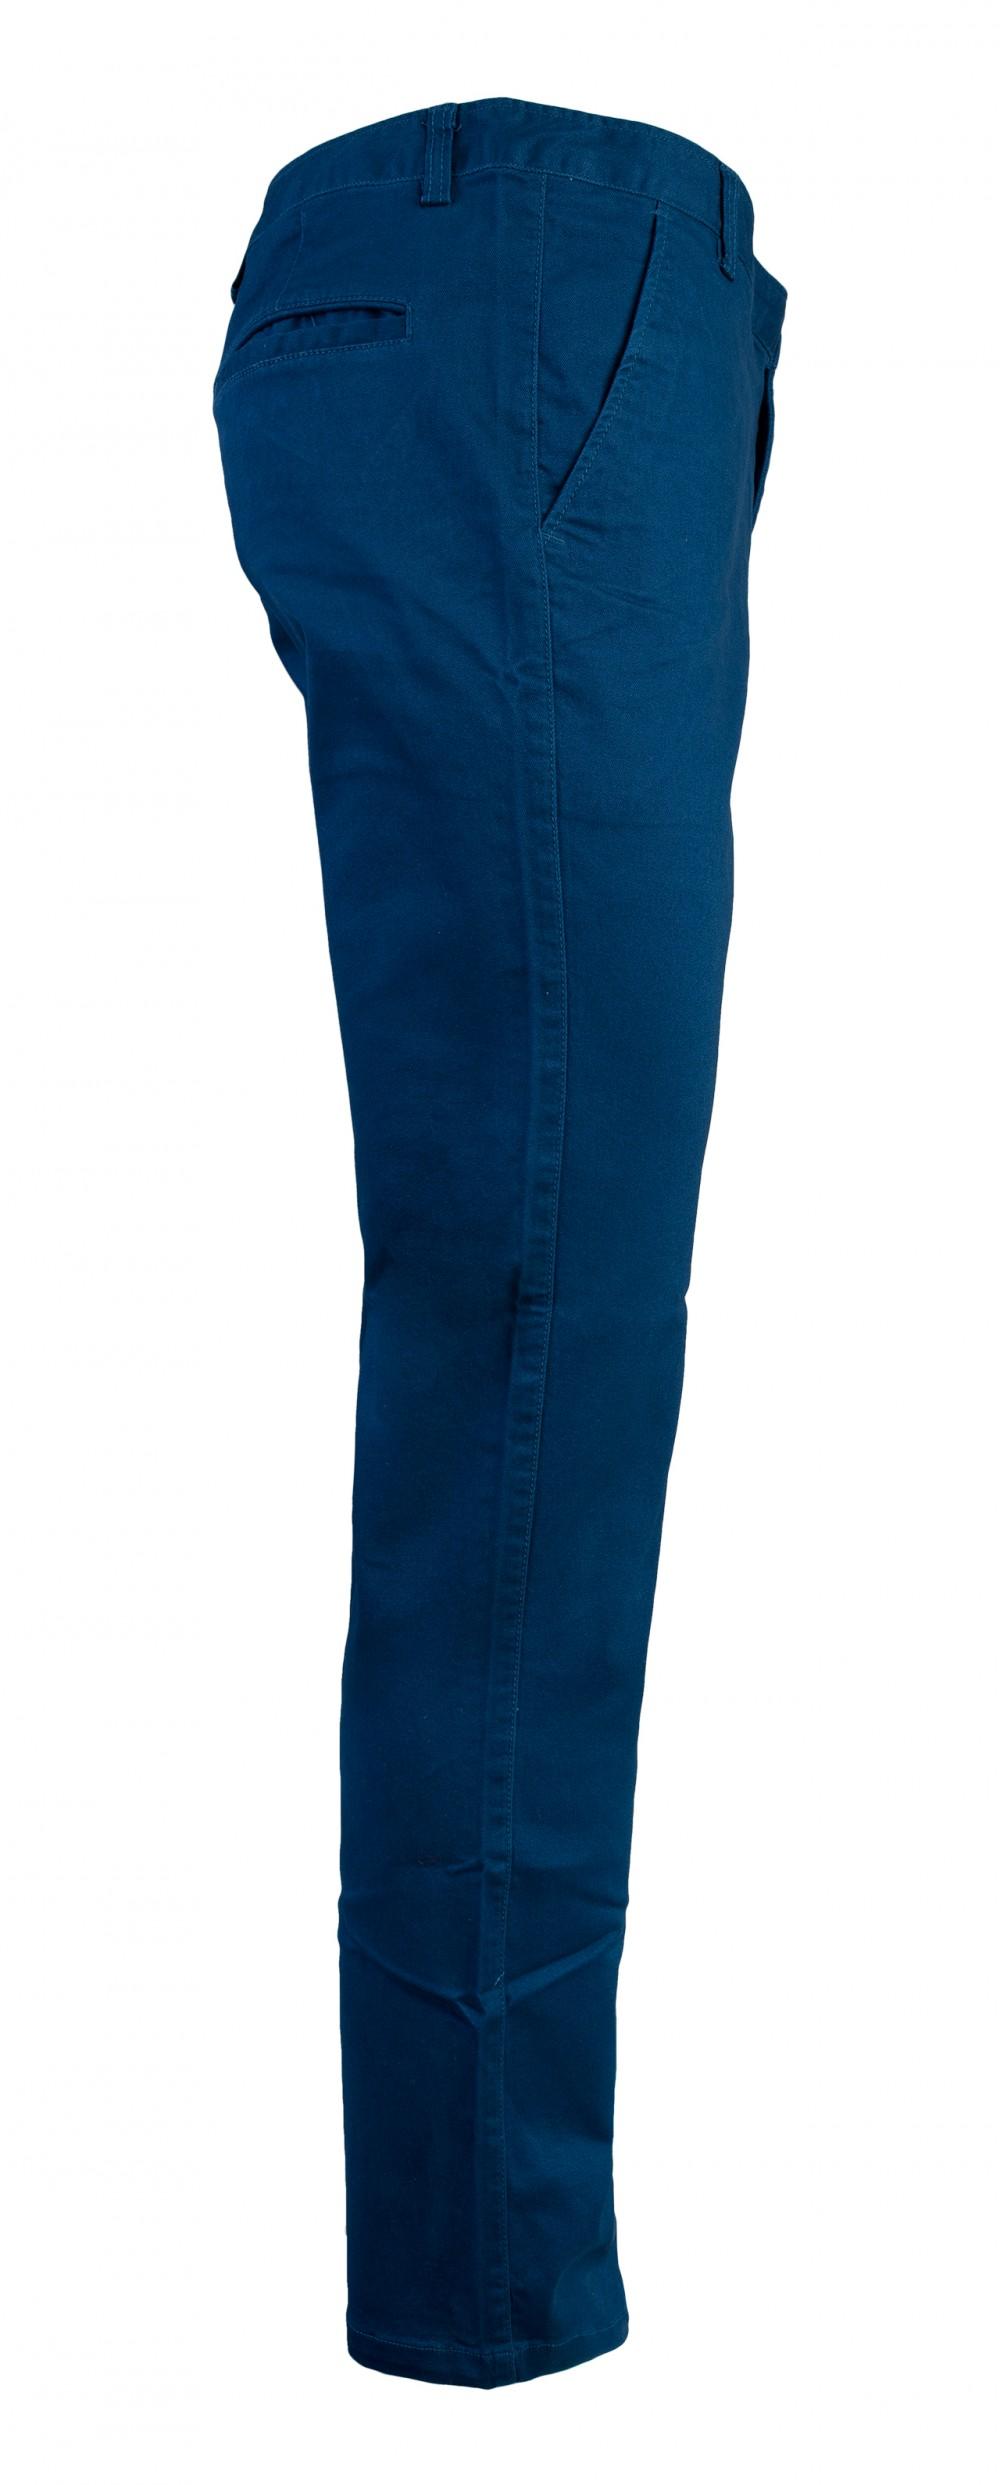 Quần kaki xanh cổ vịt qk167 - 2